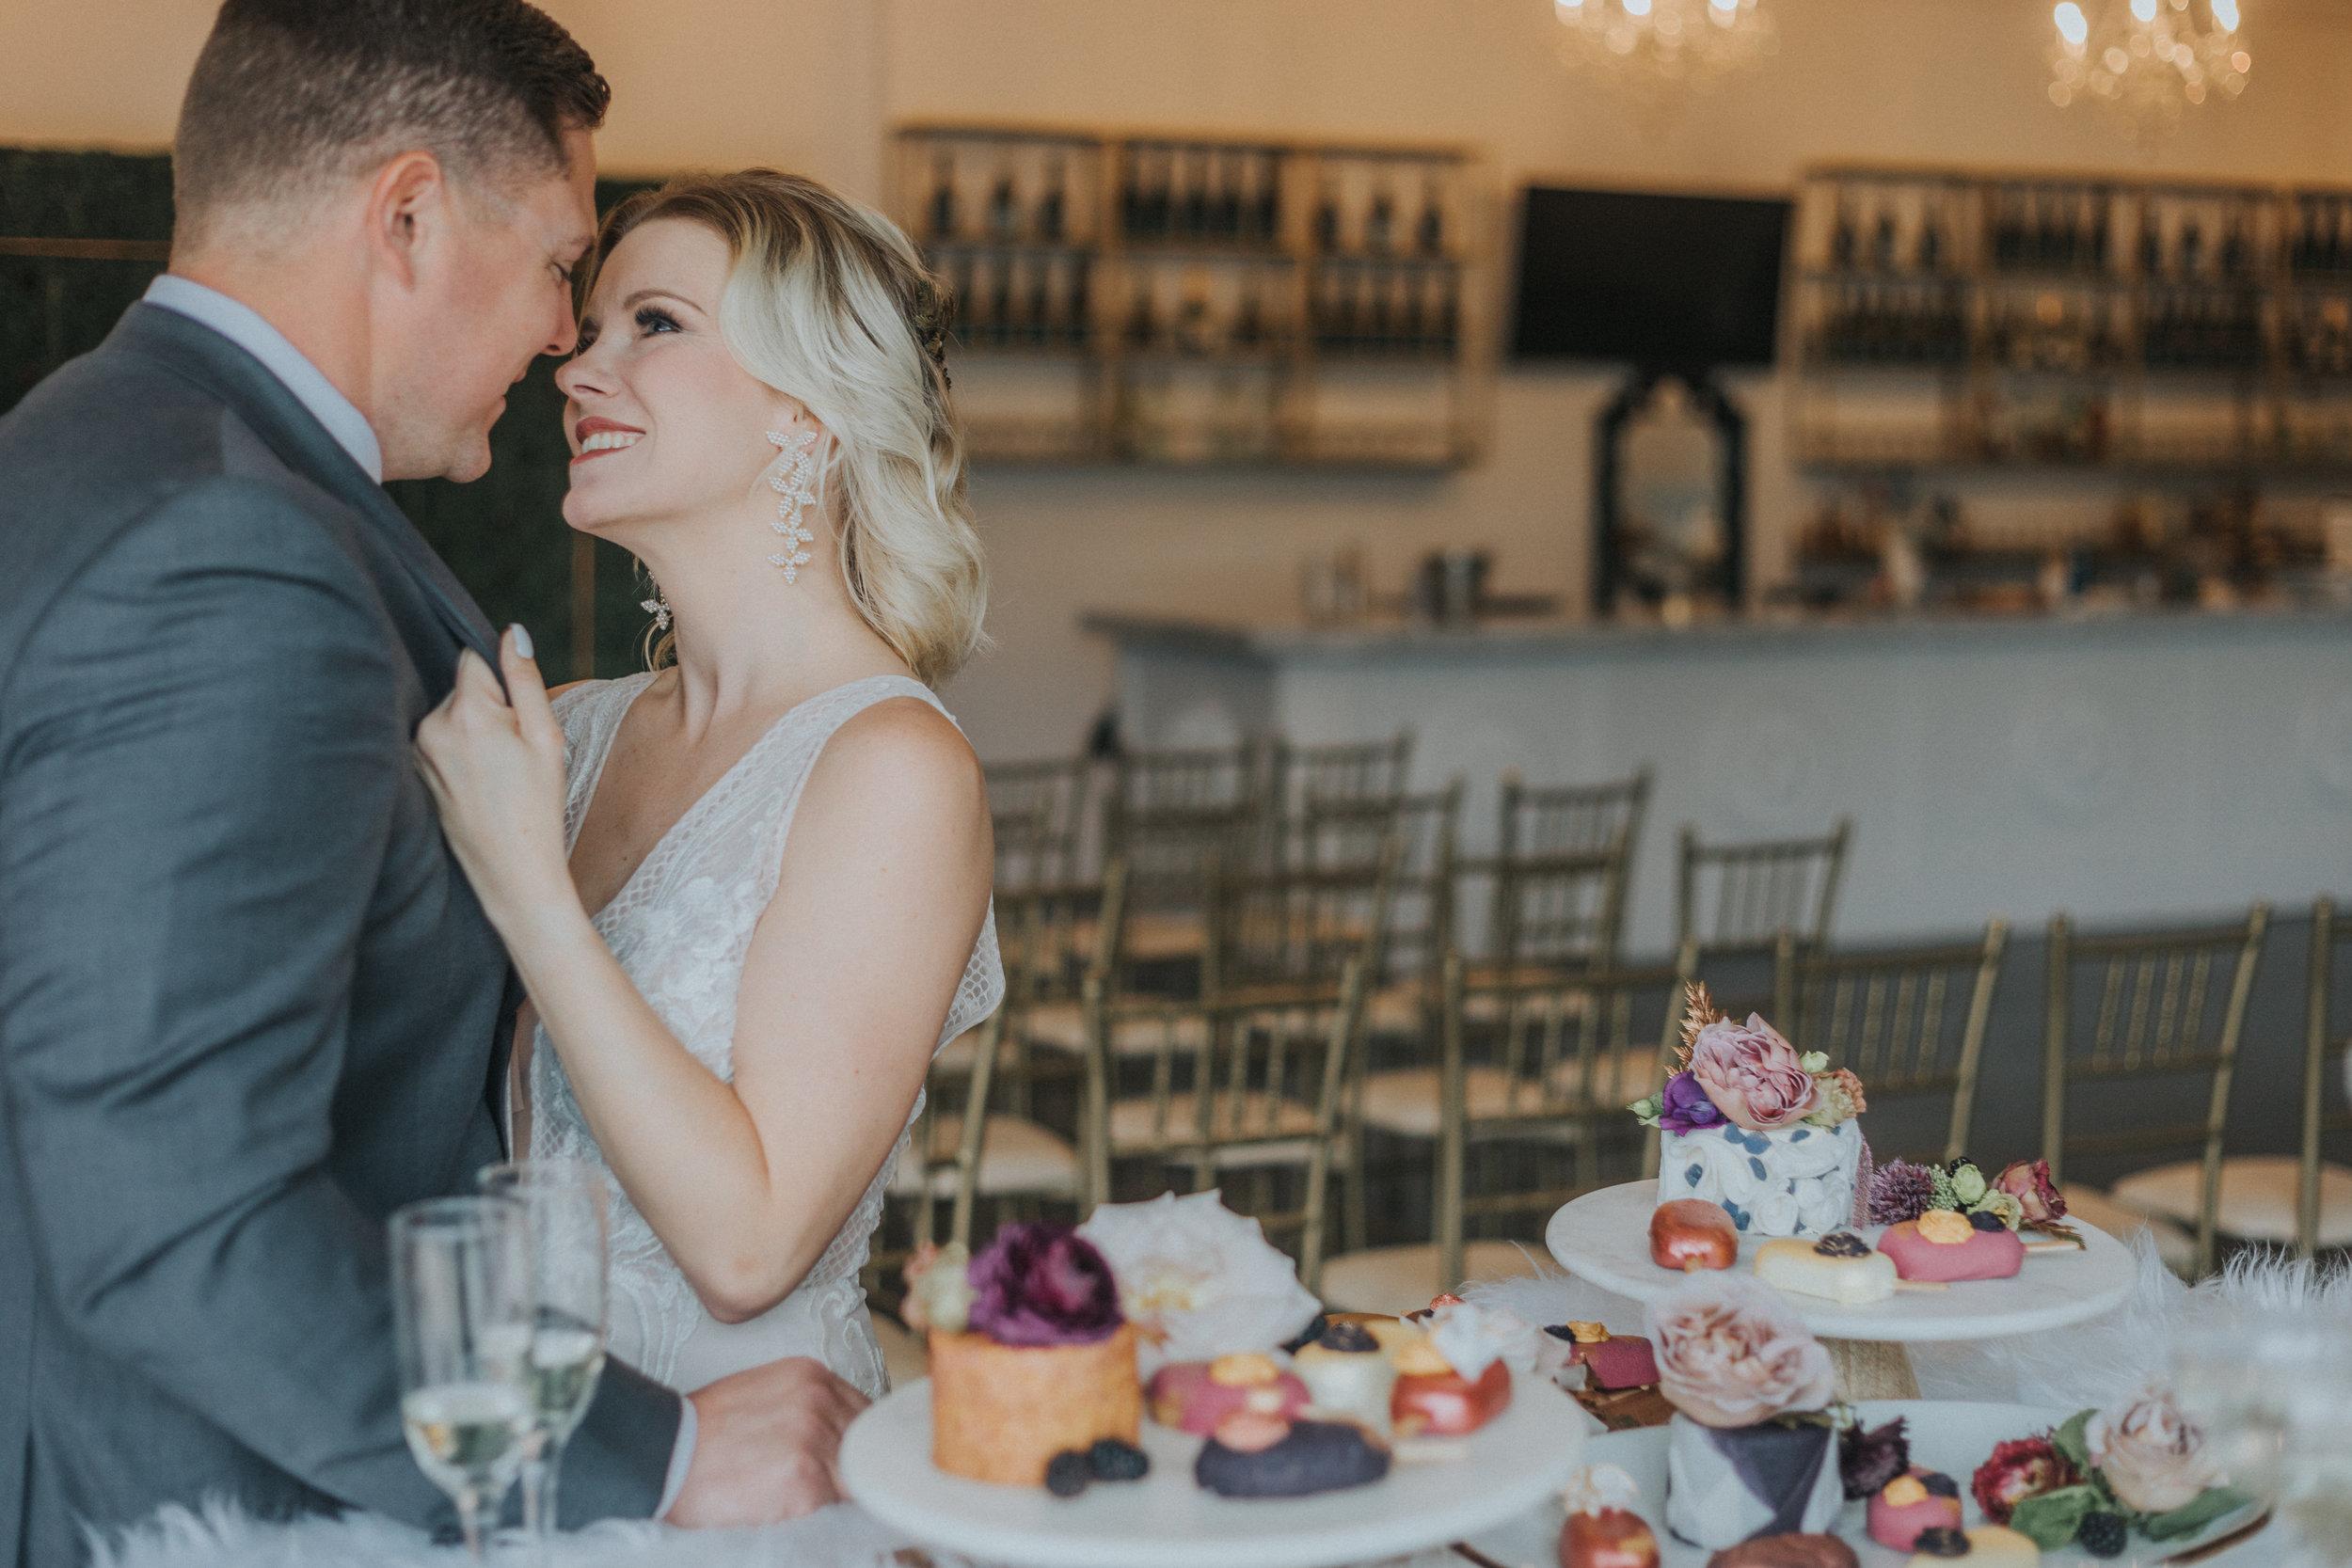 146 tiny-luxe-weddings-omaha-nebraska-midwest-empire-room.jpg